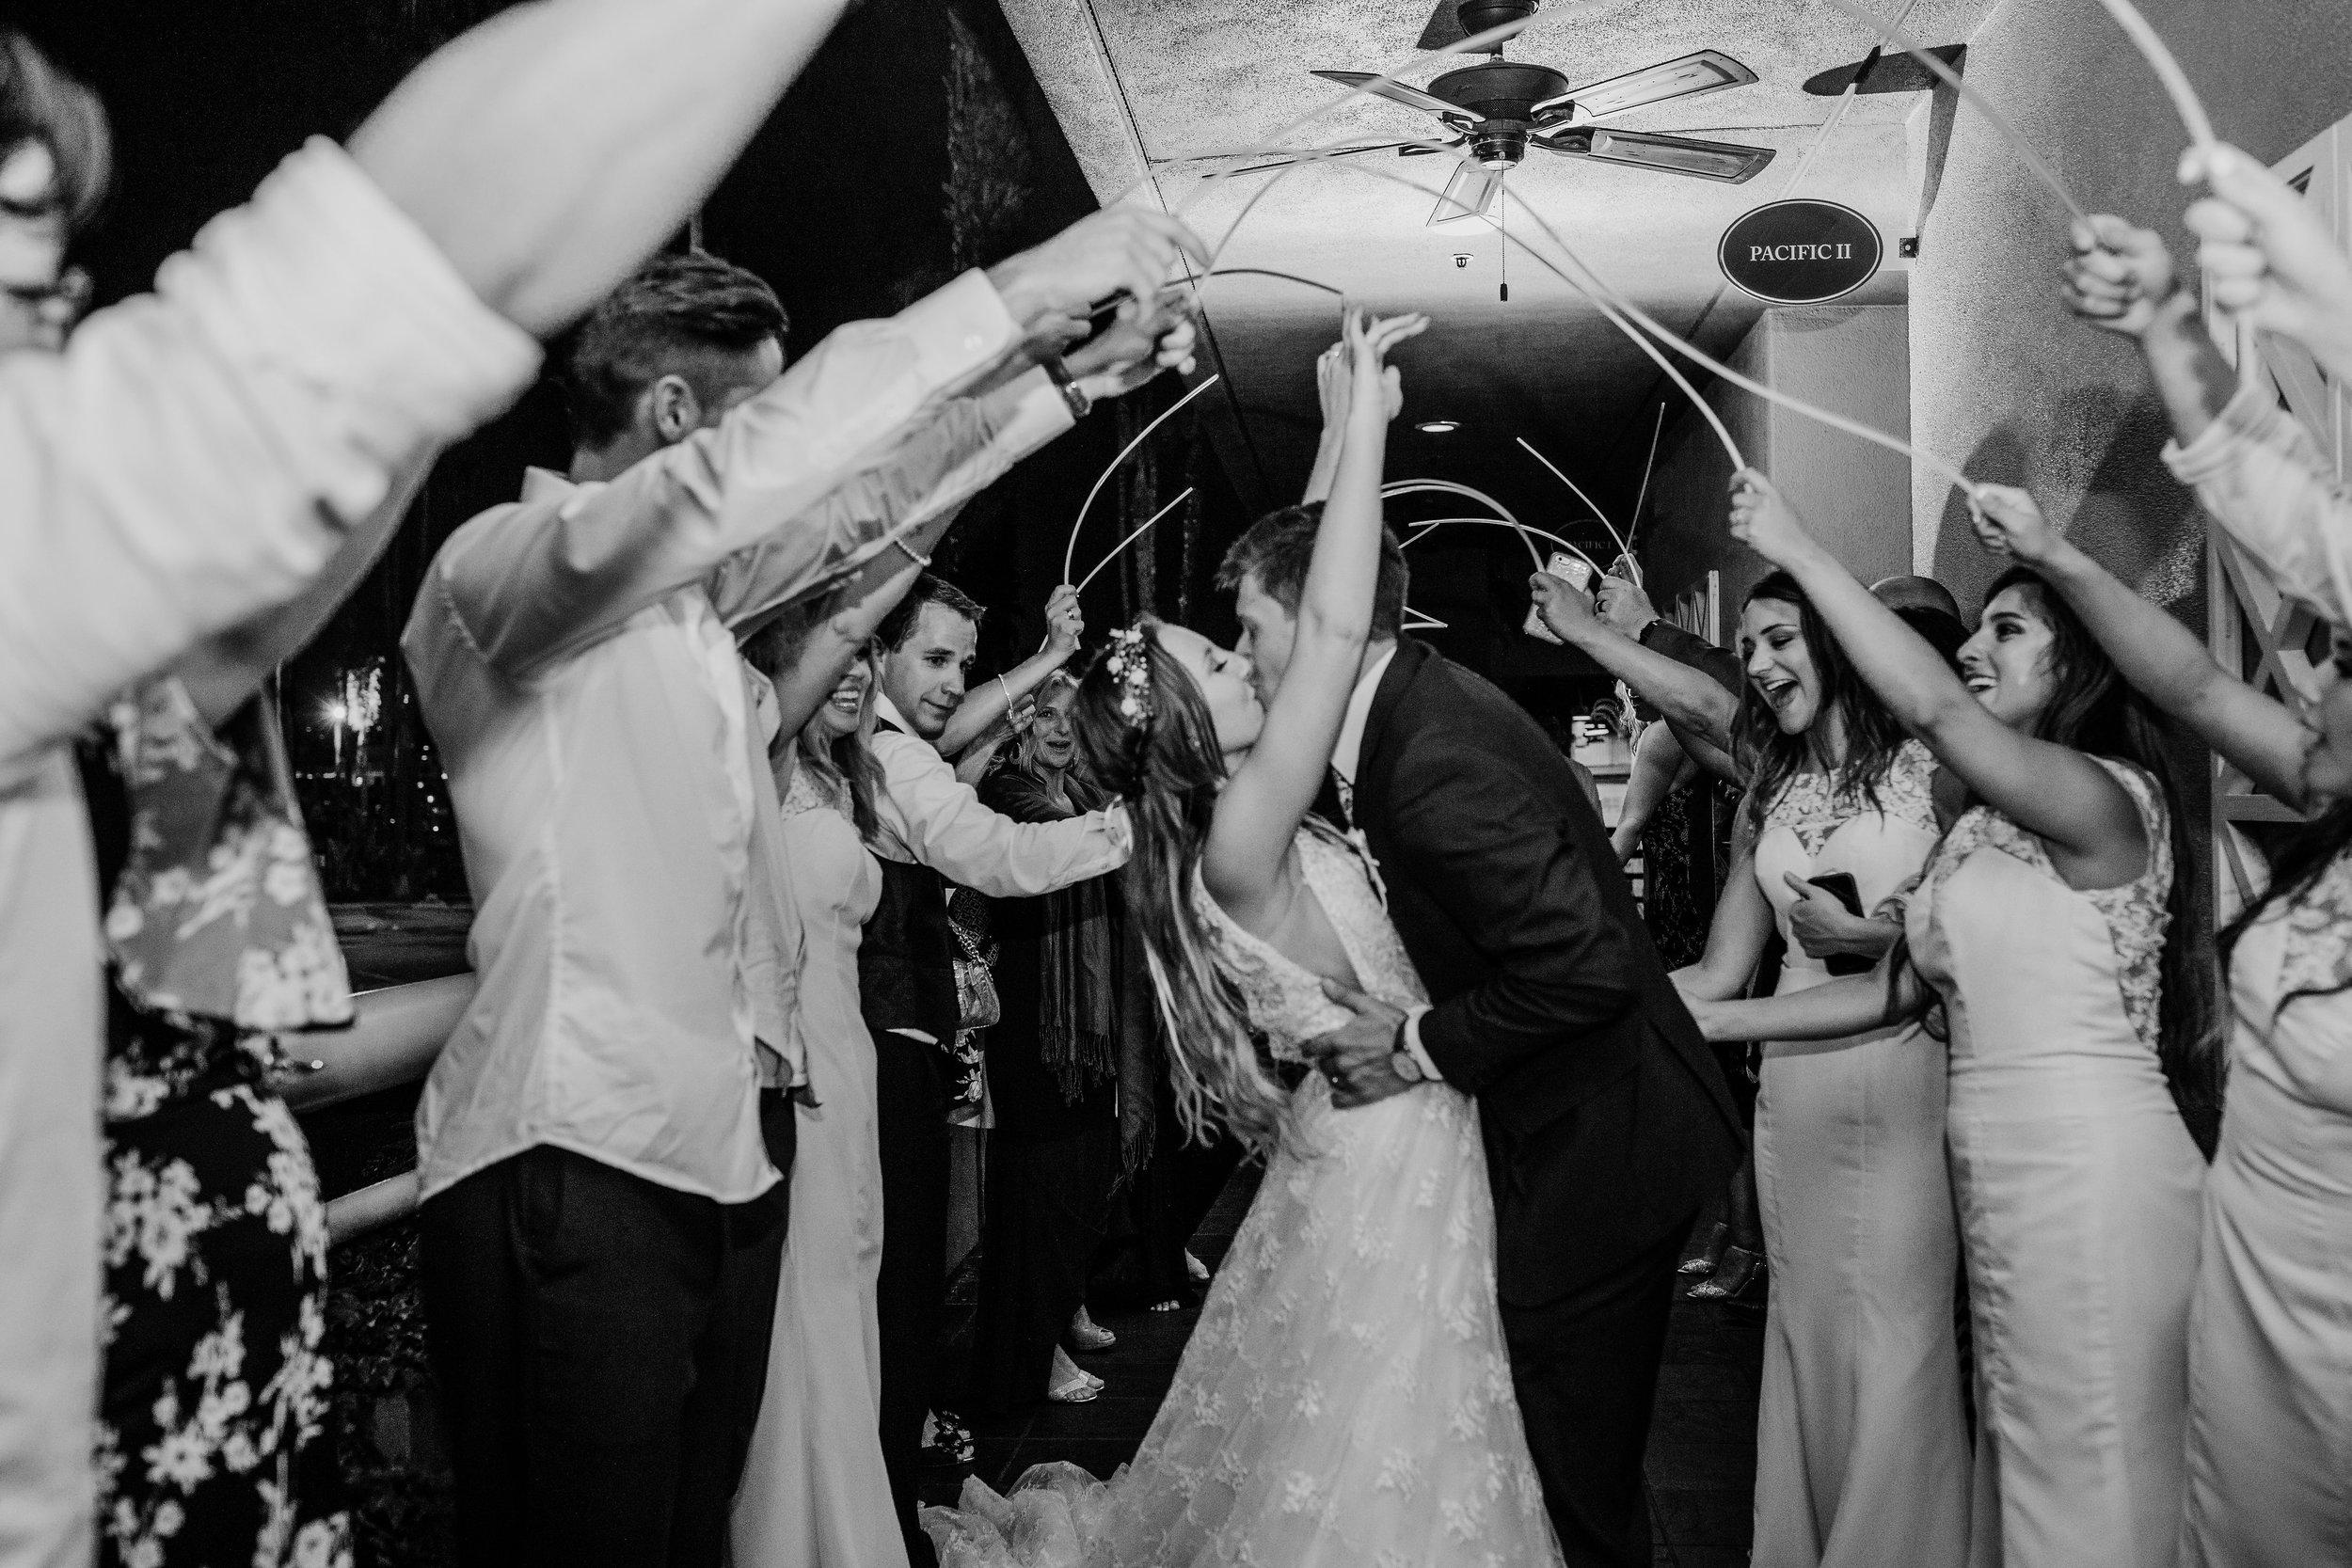 best professional wedding photographer in park city utah golw stick reception exit kissing romantic getaway car